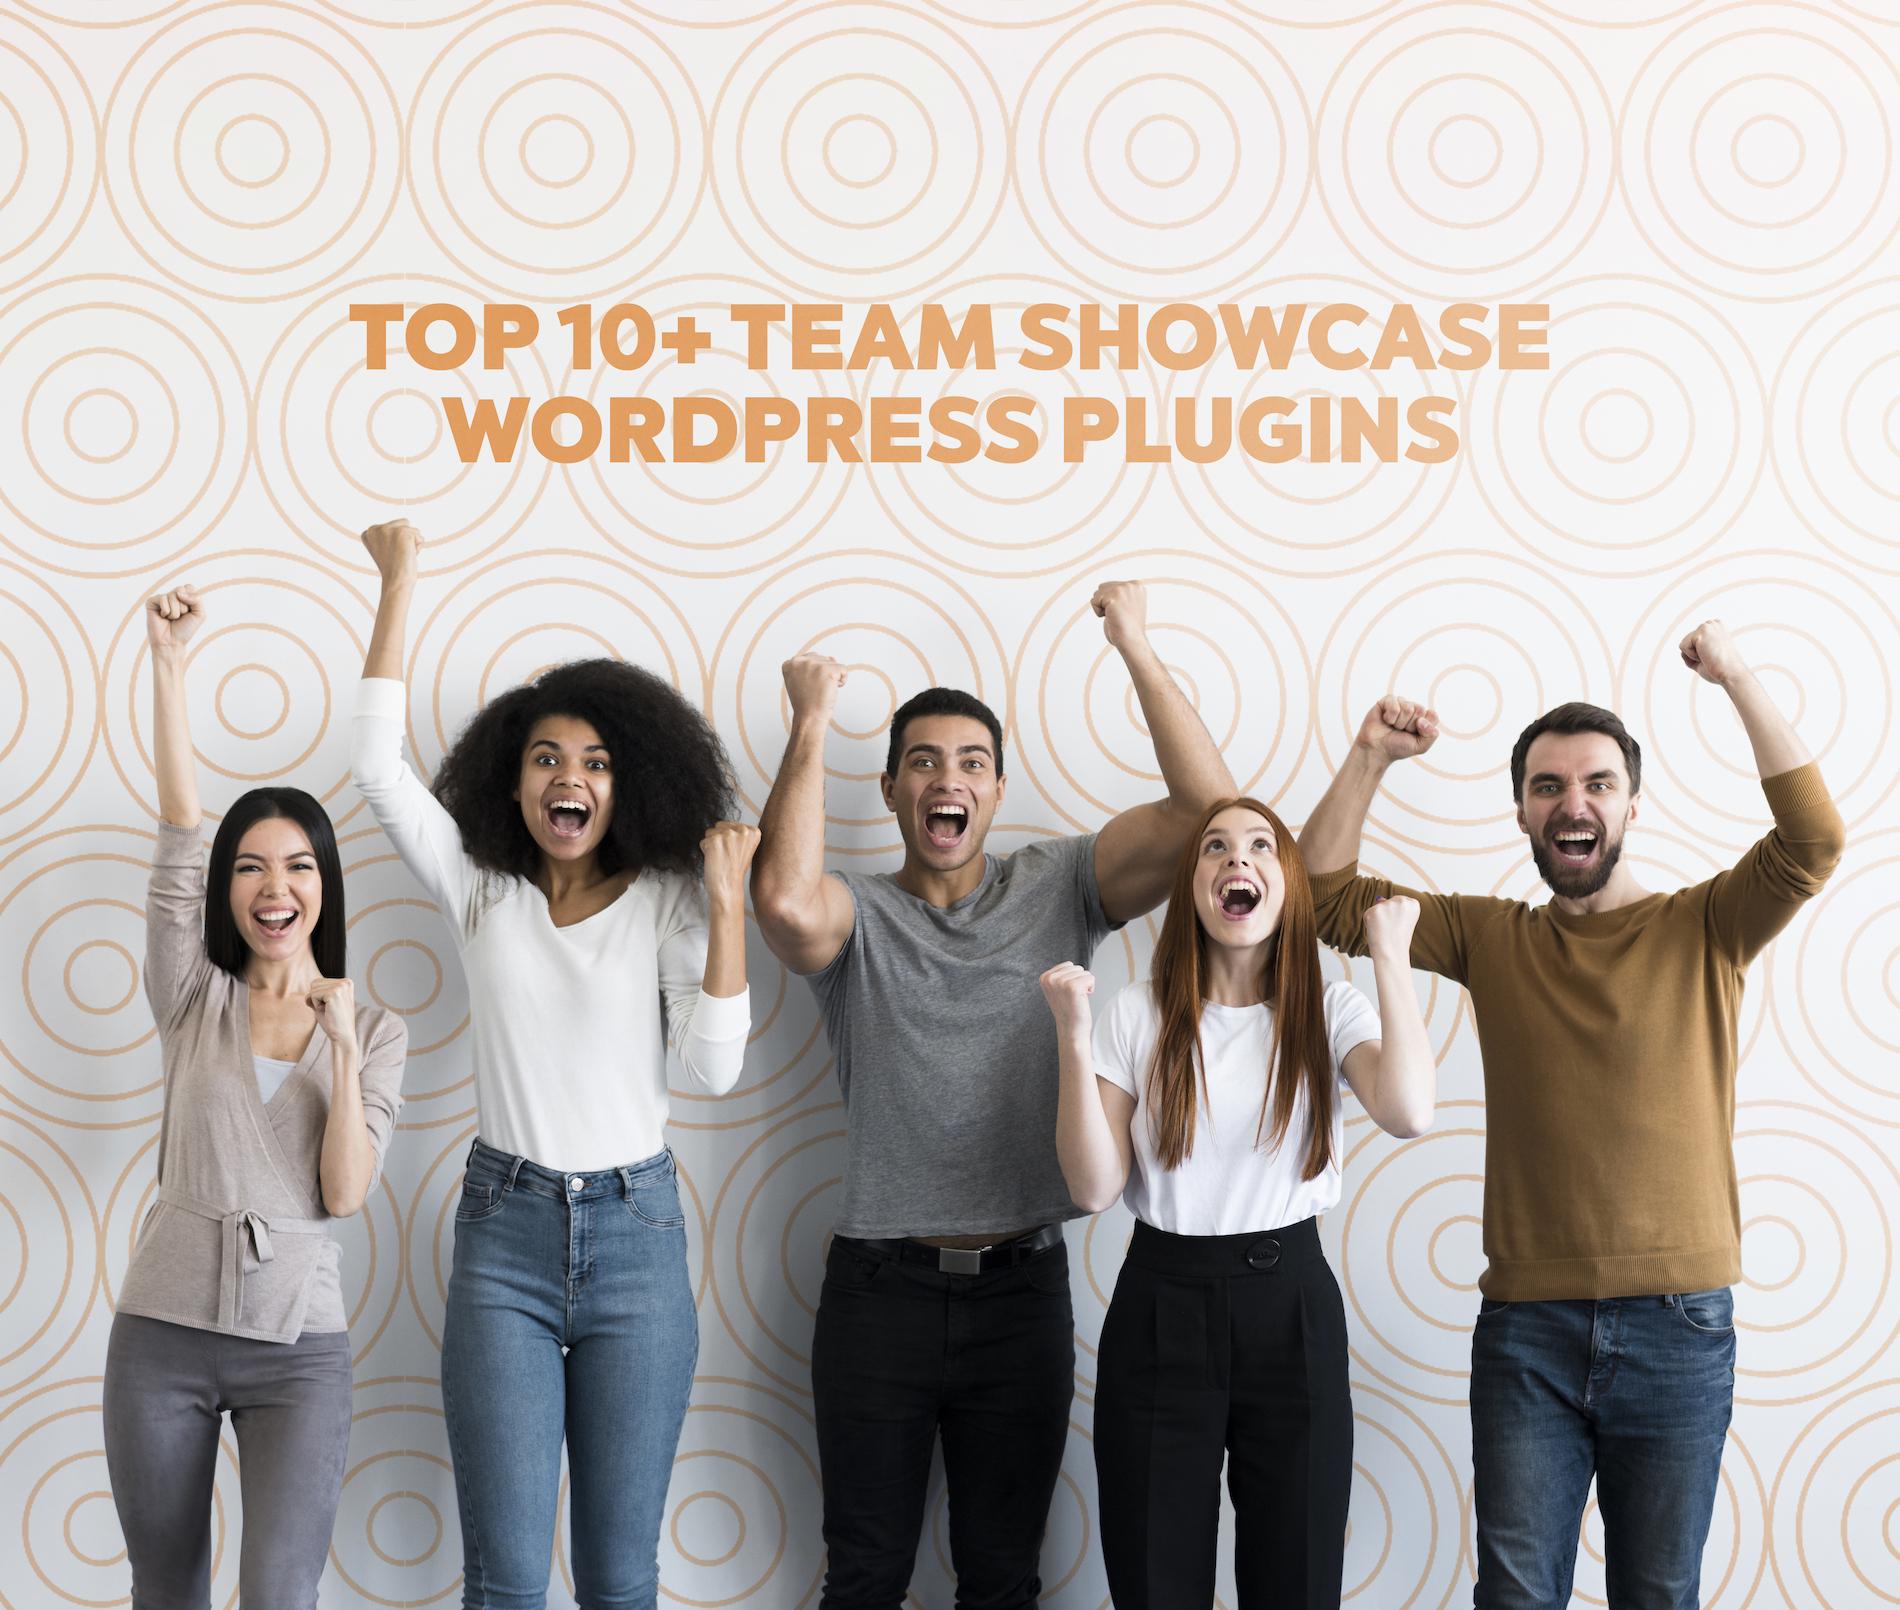 Top 10+ Team Showcase WordPress Plugins